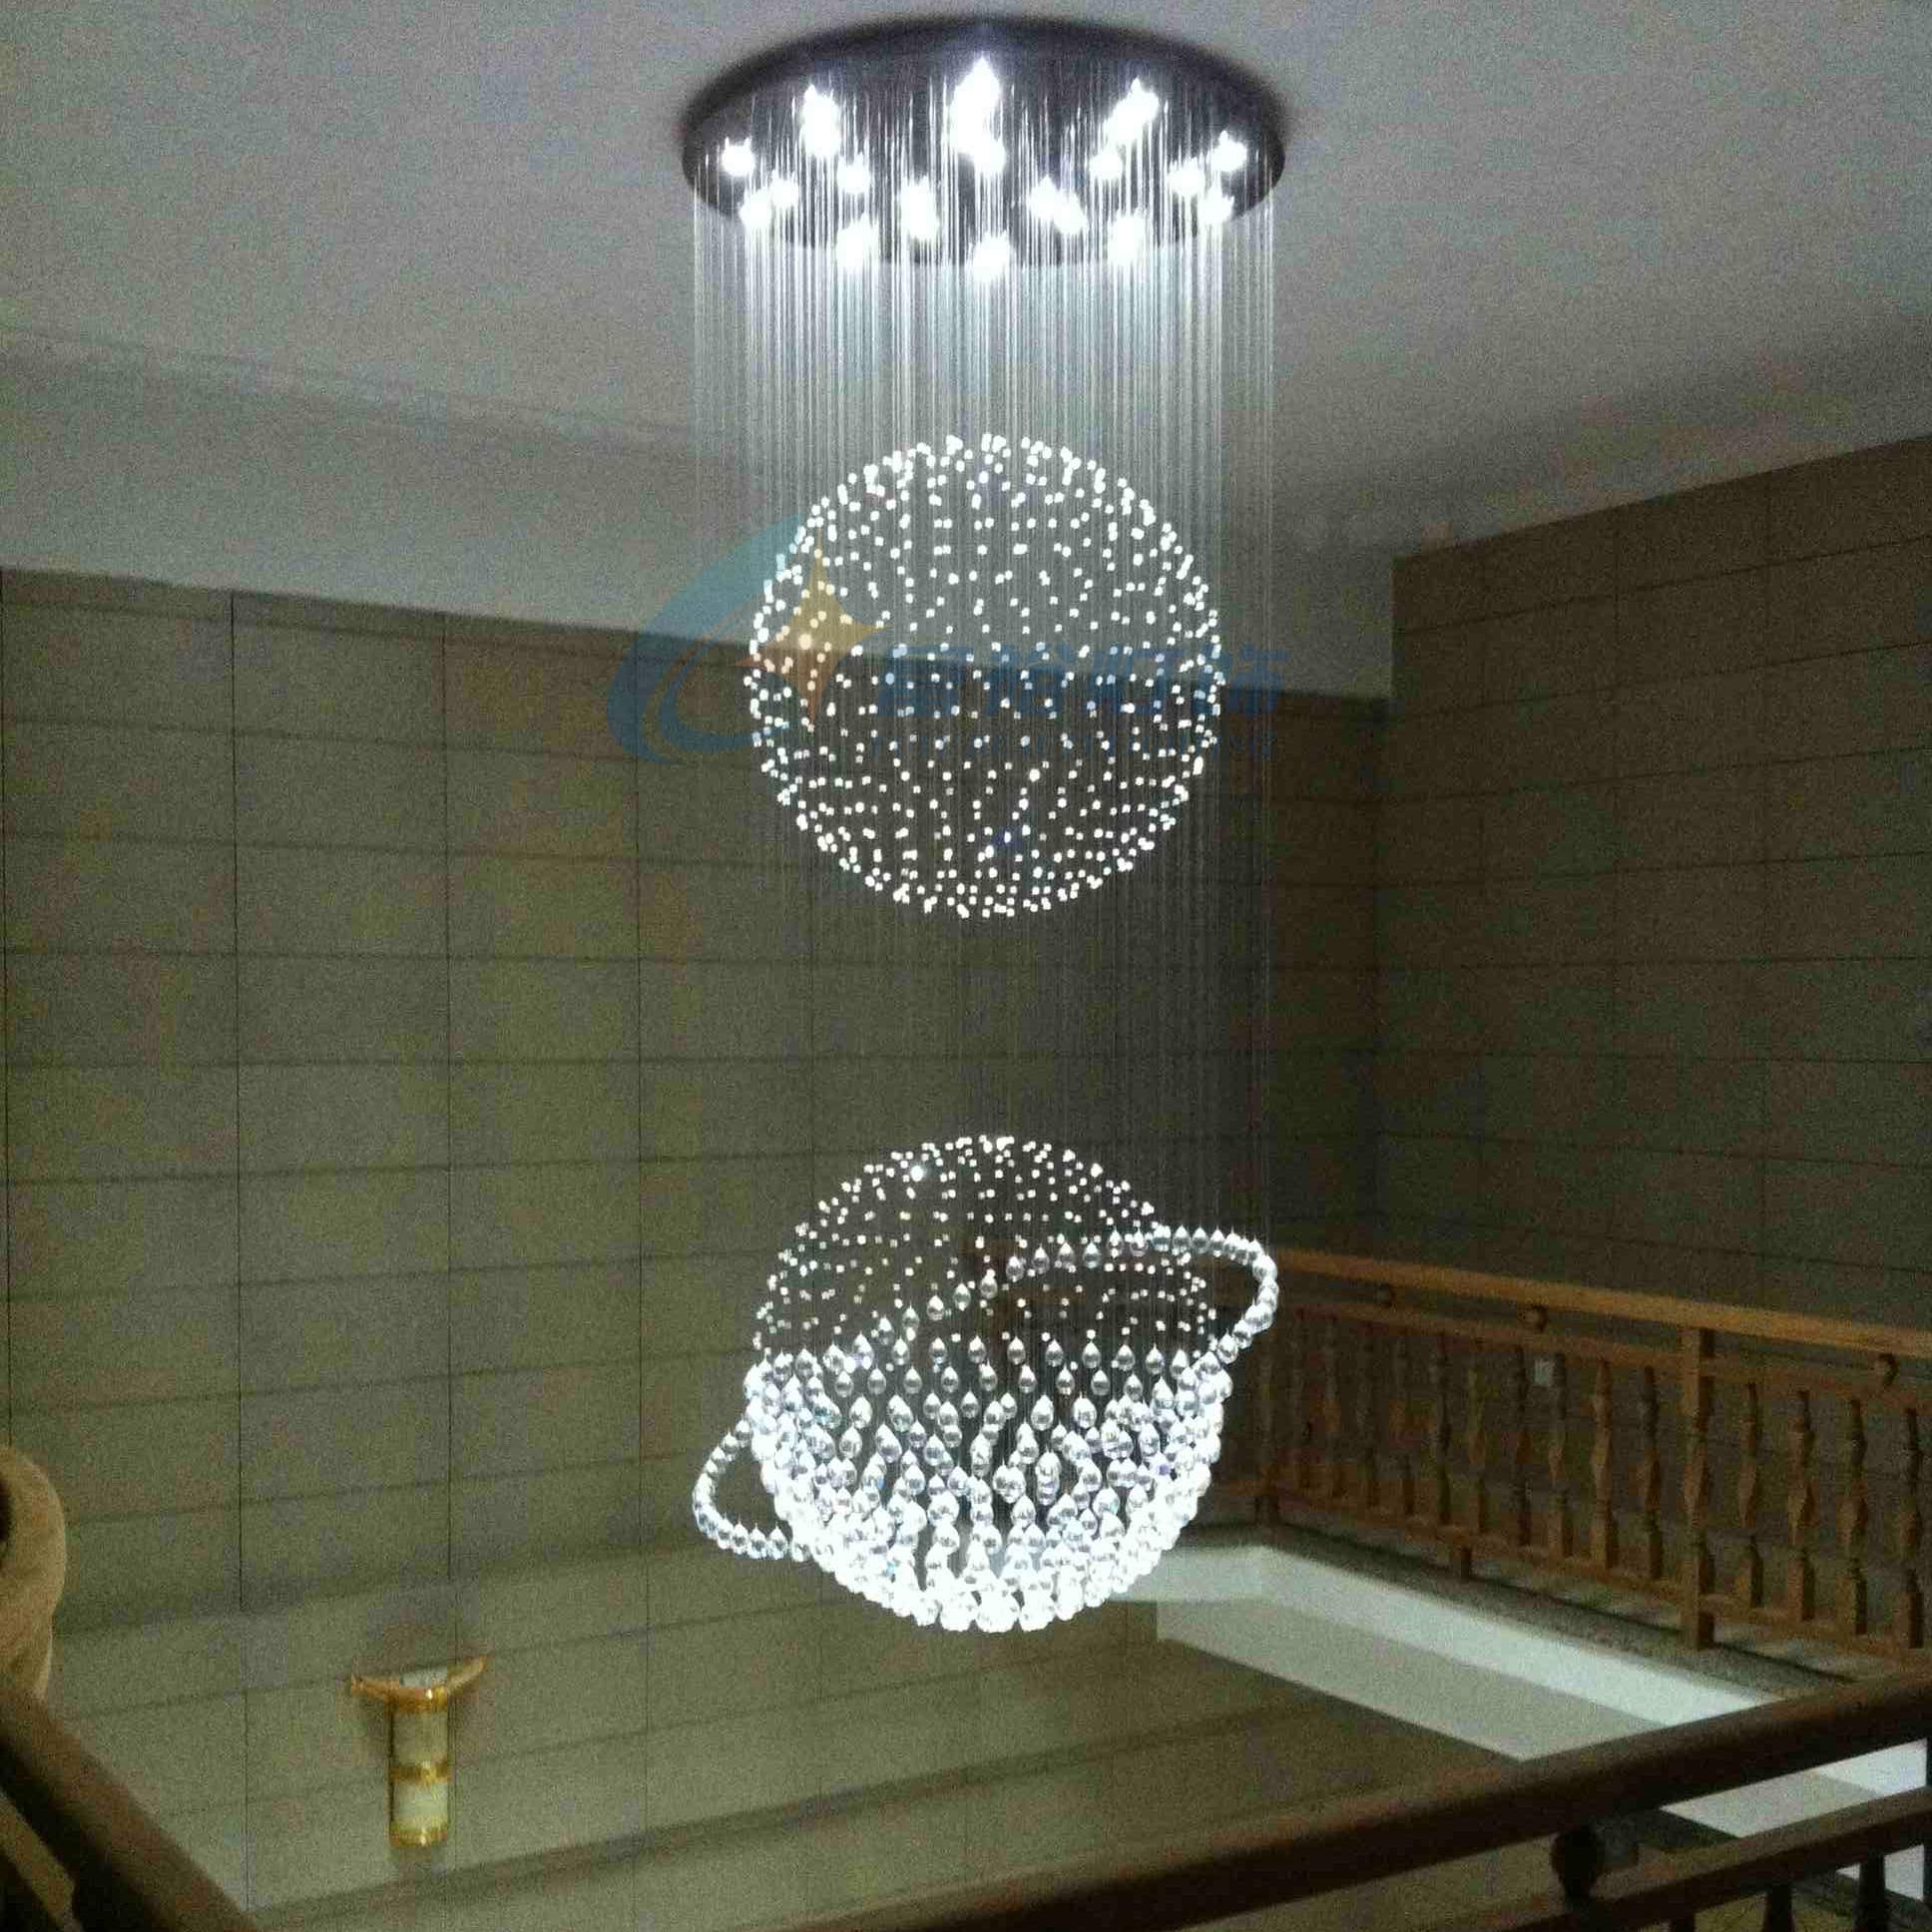 Crystal hanglamp led restaurant verlichting moderne korte lampen trap lamp grote hanglamp 8632china